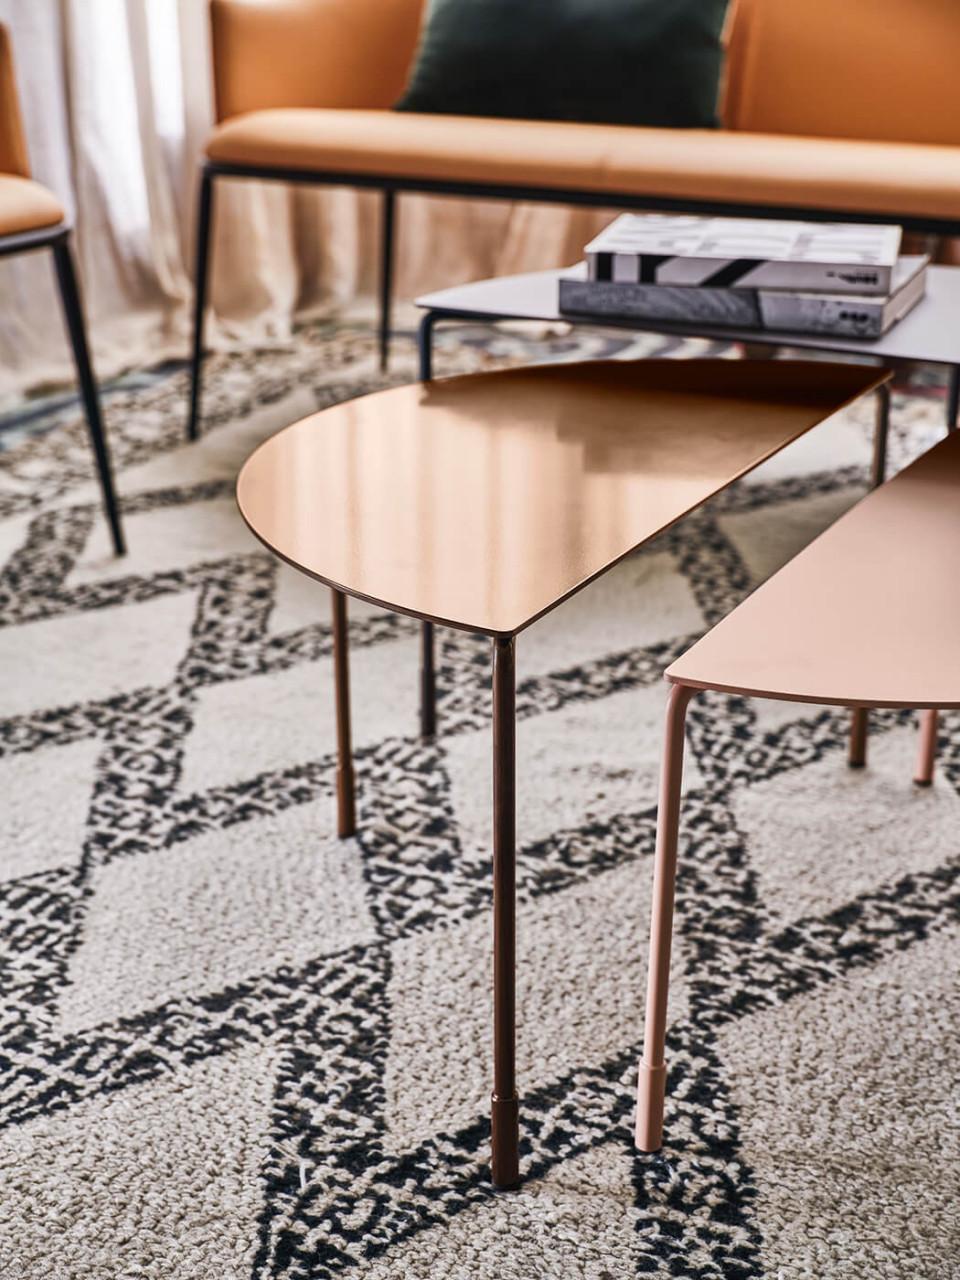 Detail of Hoodi coffe tables